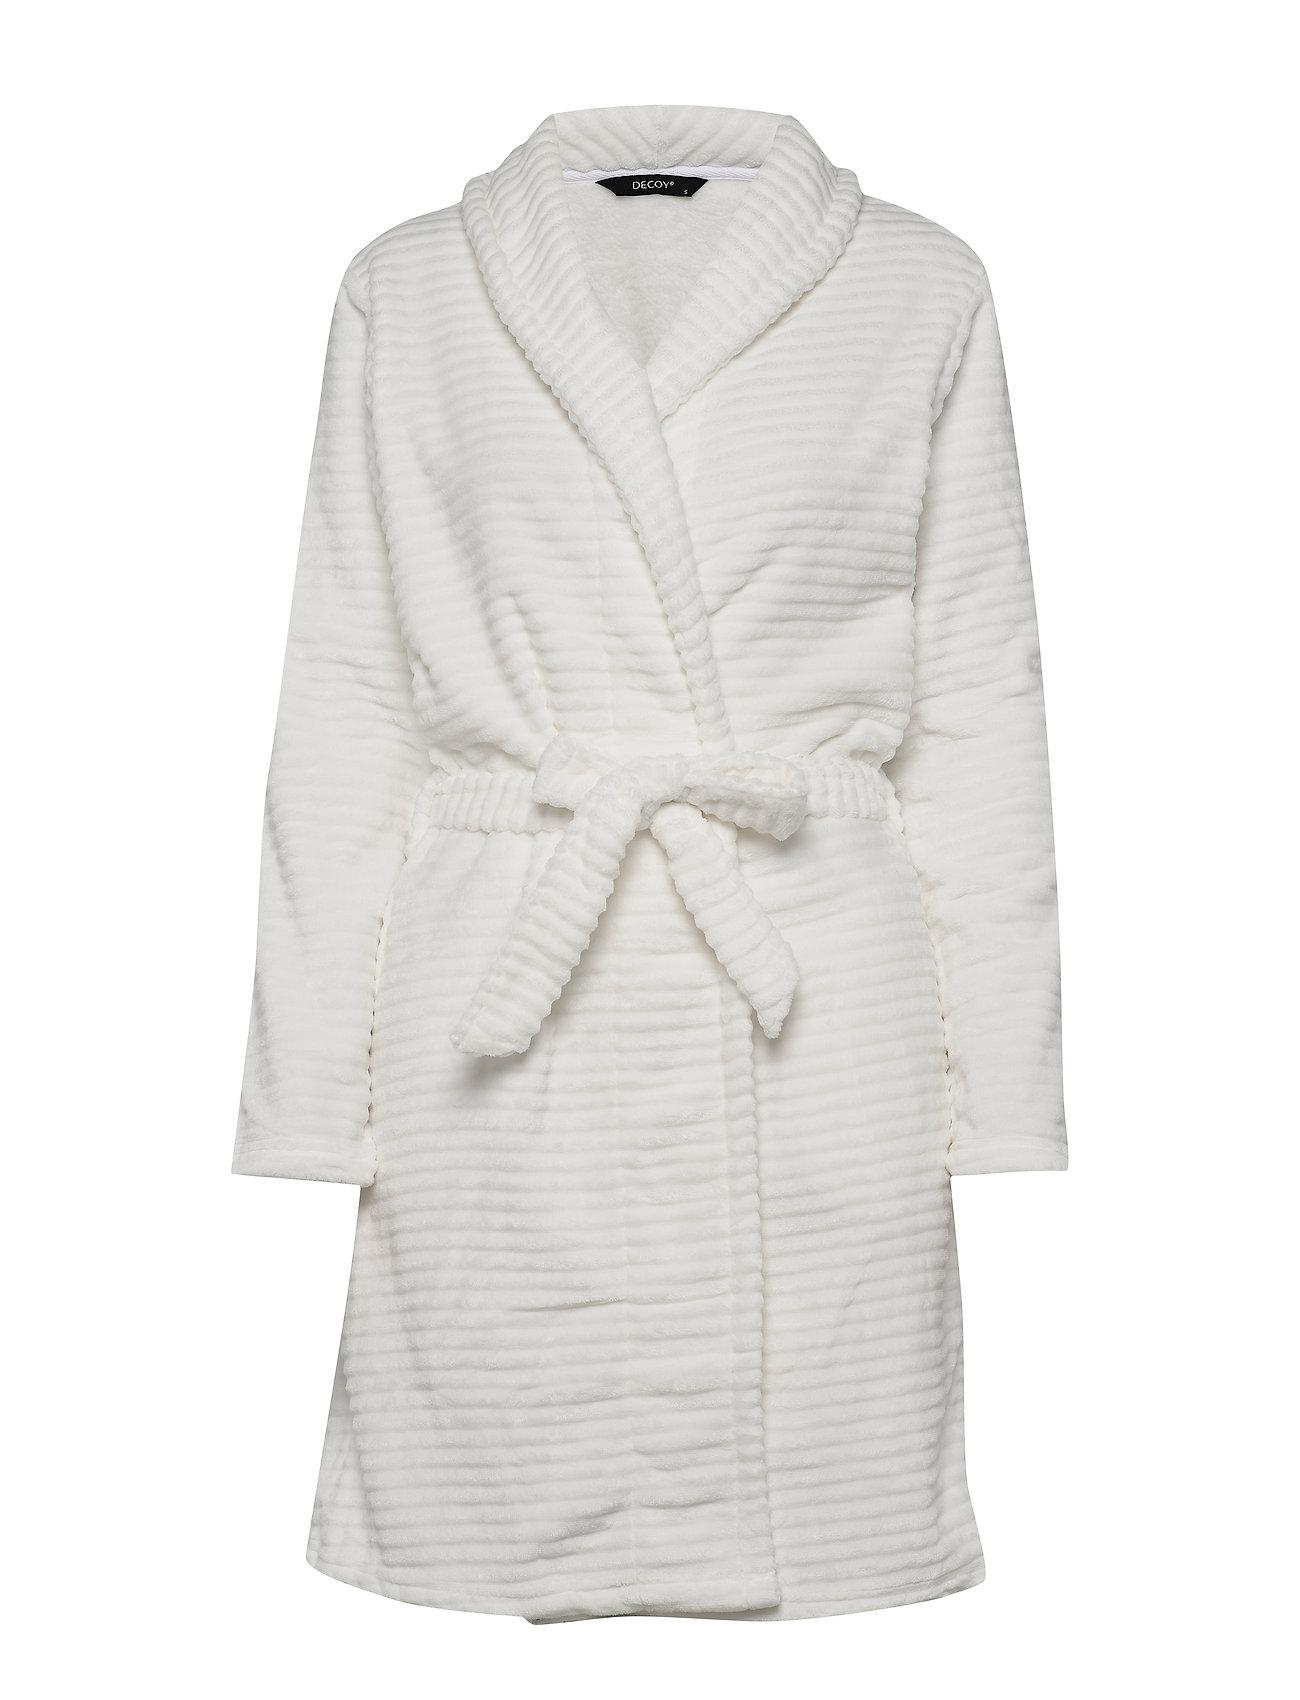 Decoy DECOY short robe w/stripes - CLOUD DANC